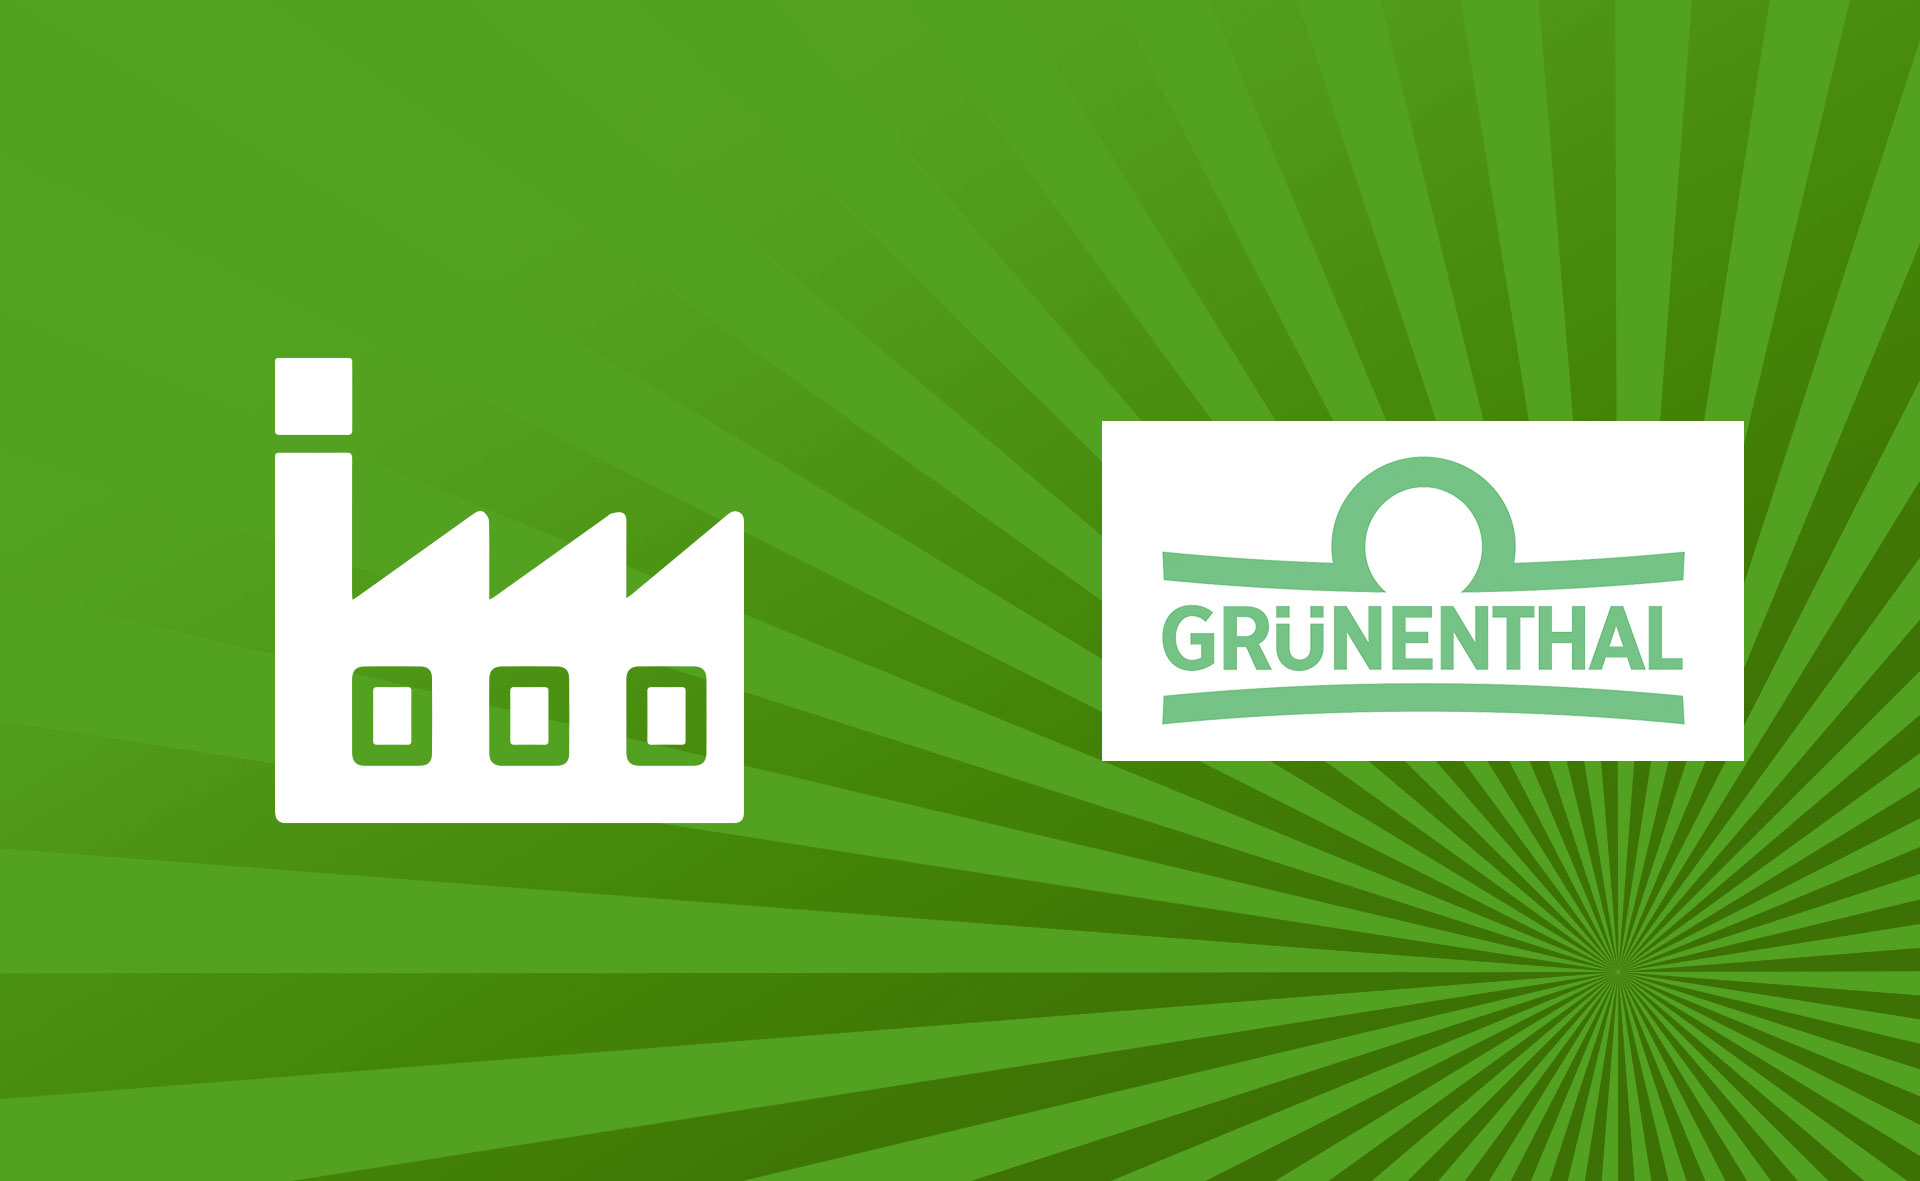 Grünenthal Group